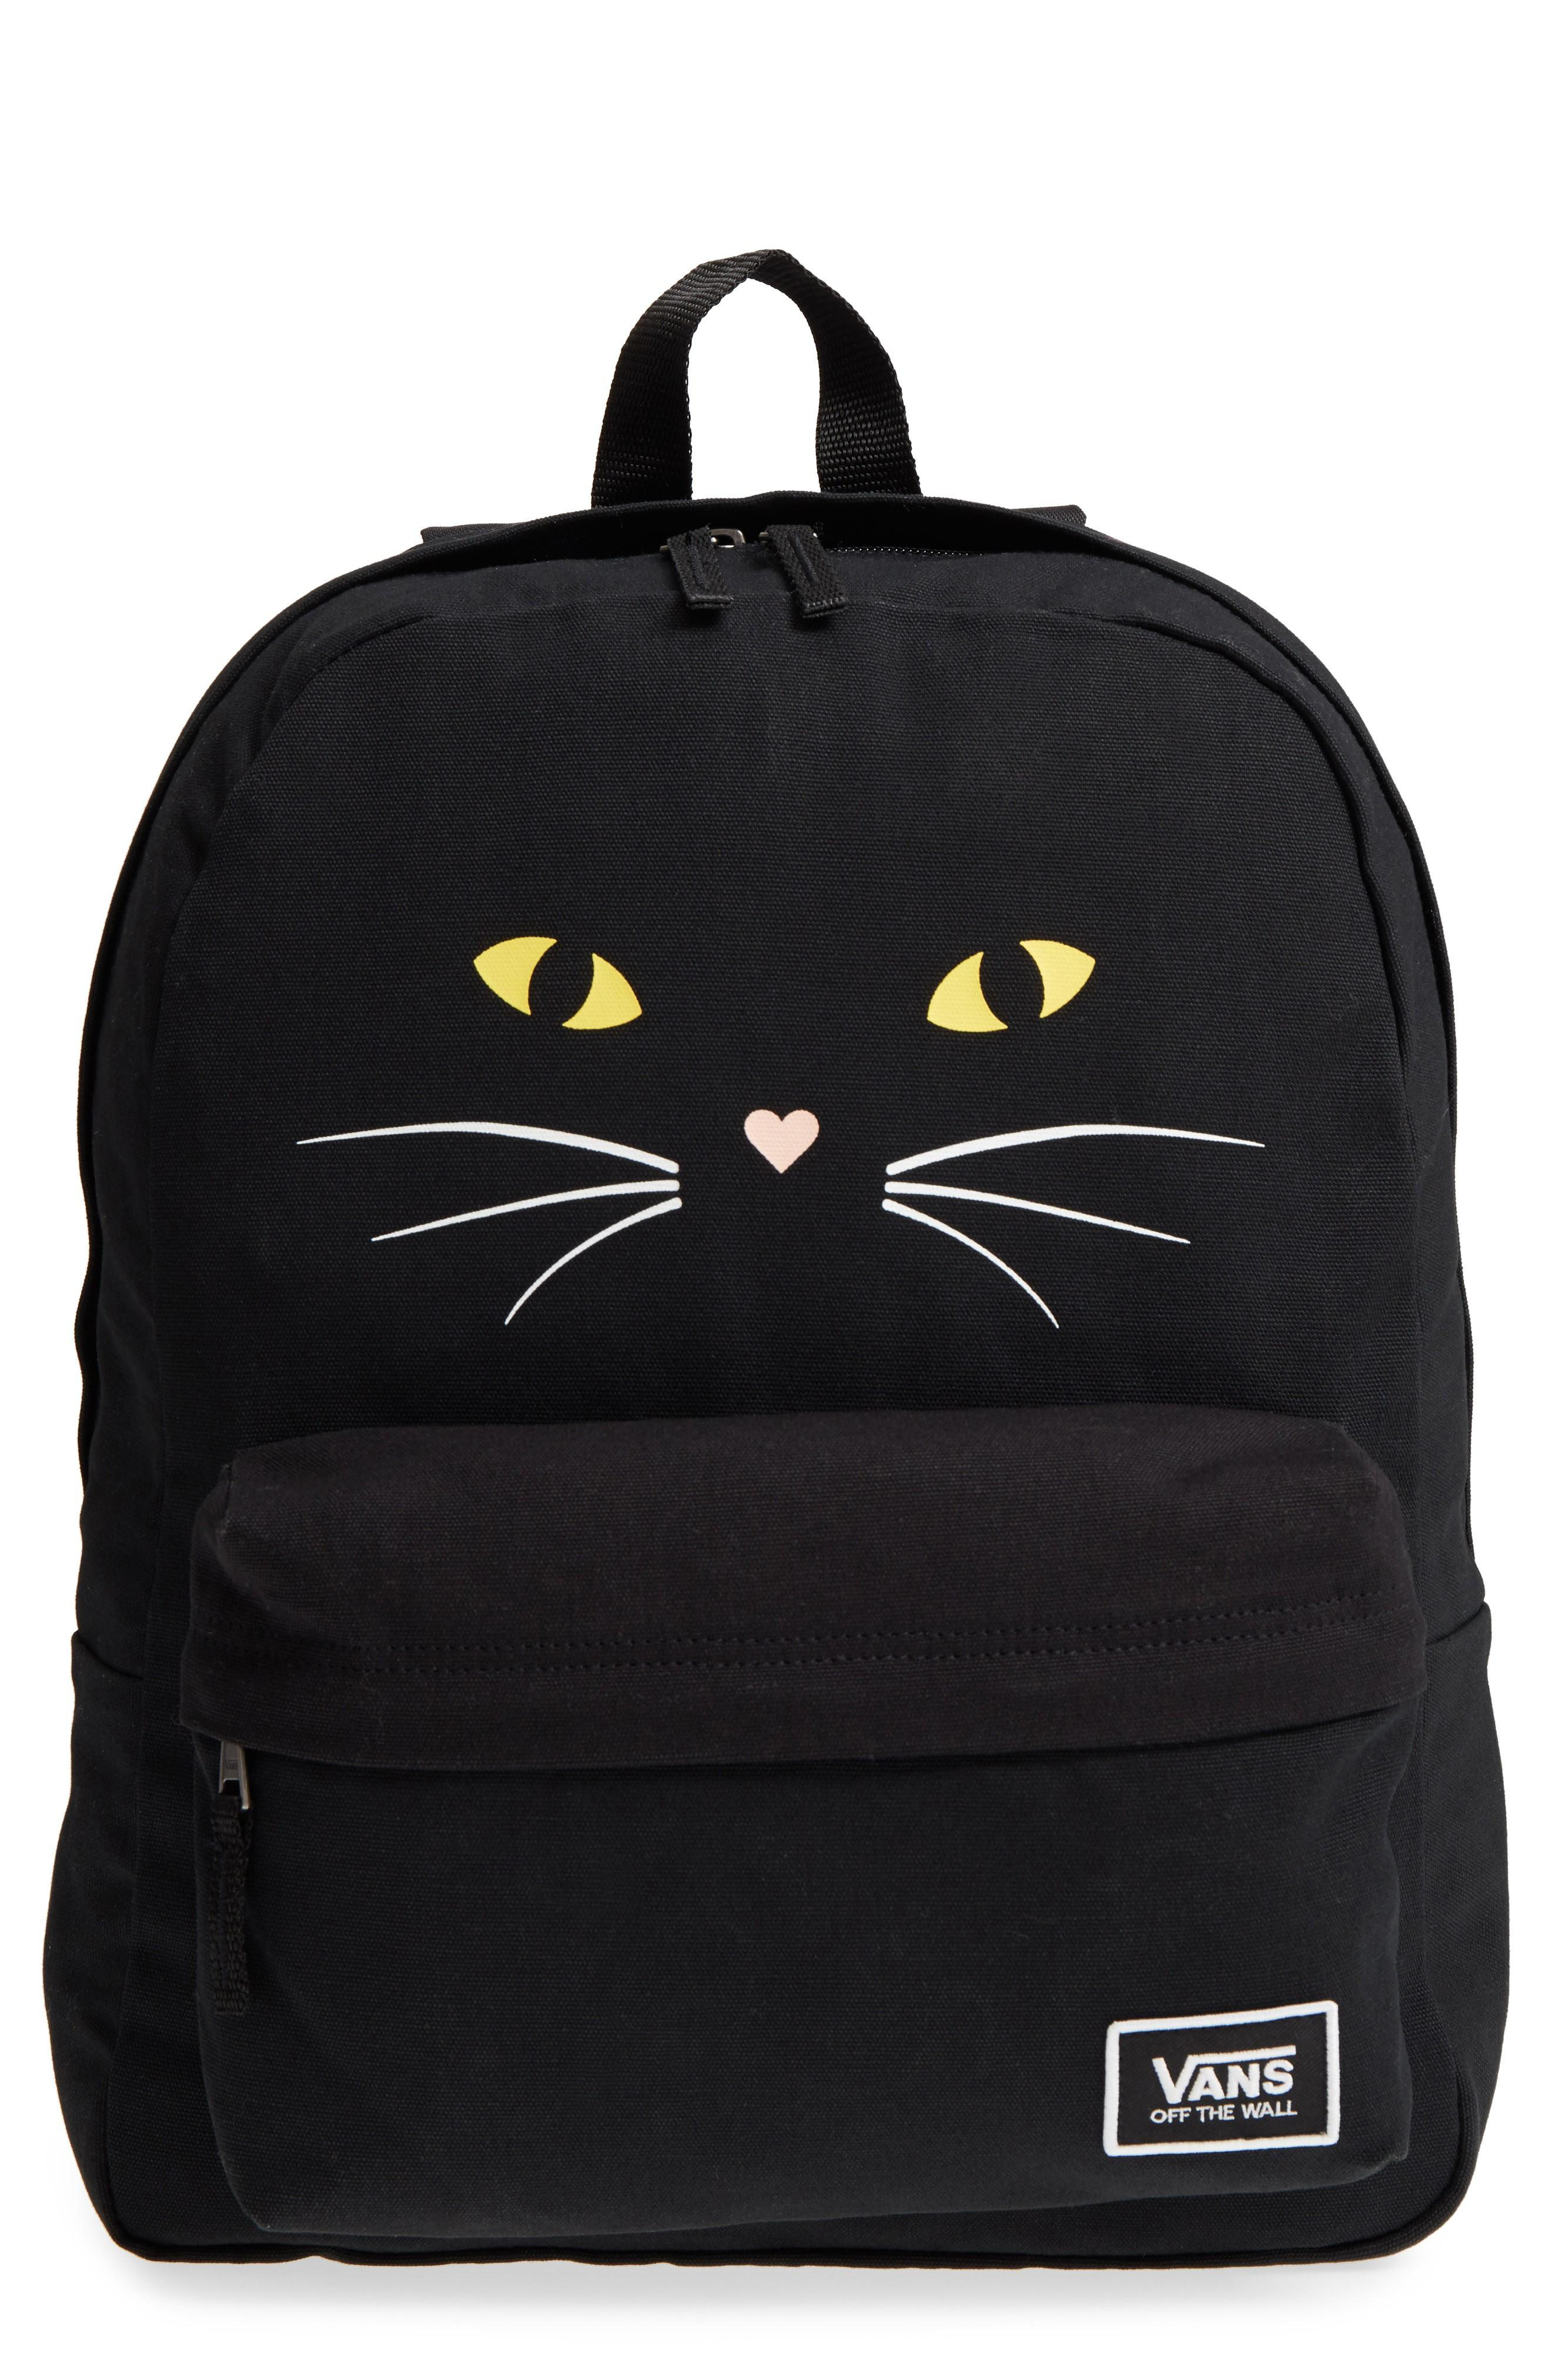 d624584a21 Vans Realm Classic Backpack - Black In Black Cat